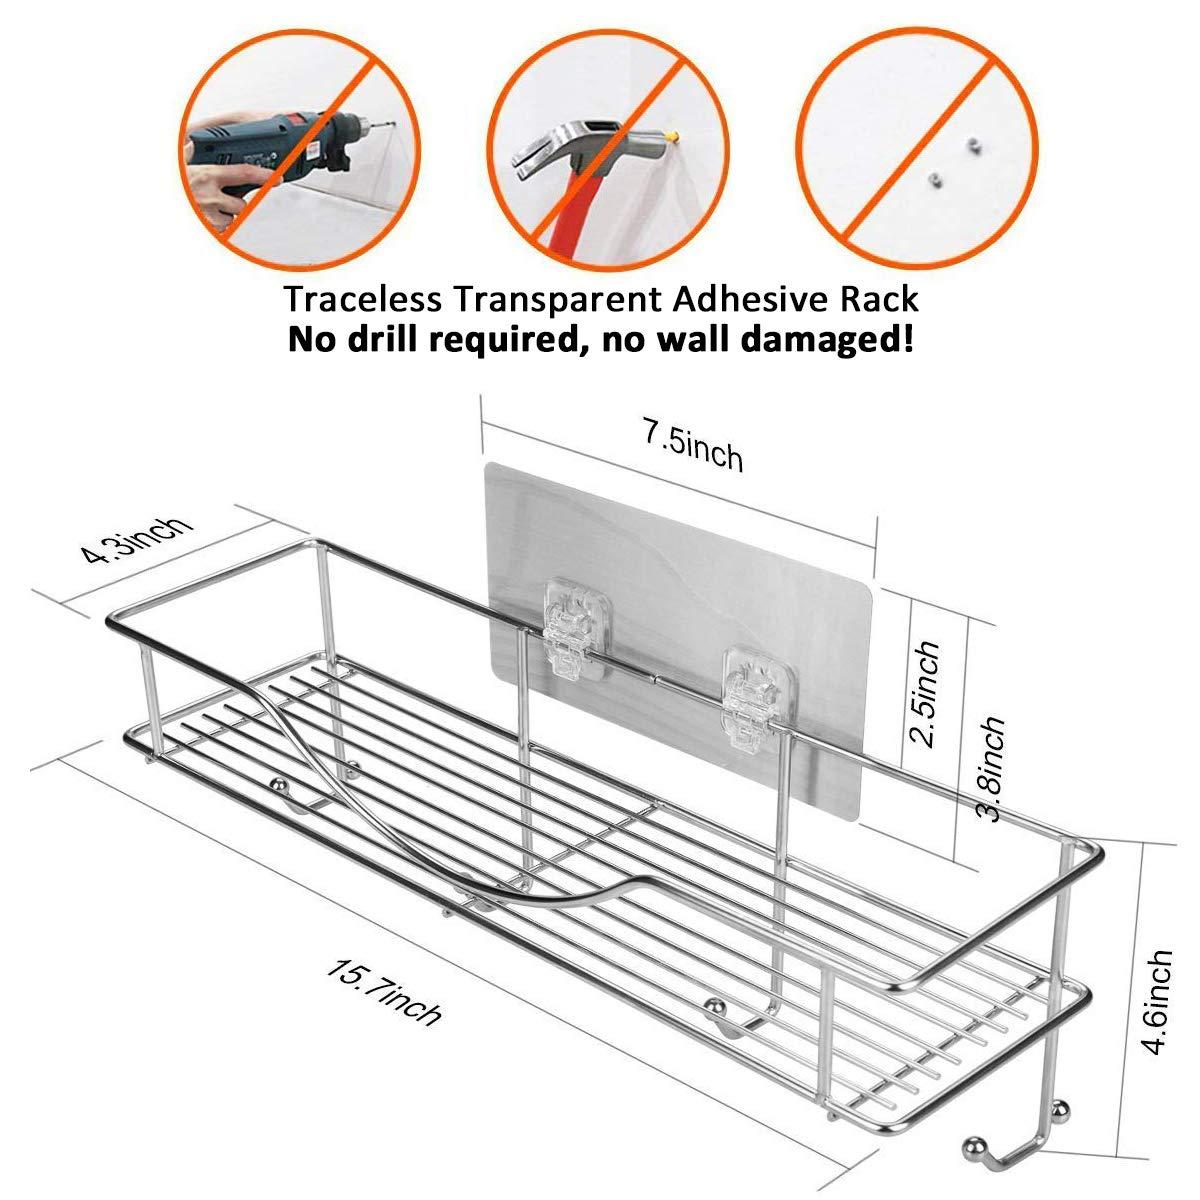 AISHN Bathroom Shelf Stainless Steel Shower Shelf Kitchen Rack Bathroom Storage Organizer with Towel Hooks Wall Mount Adhesive Shower Caddy No Drilling